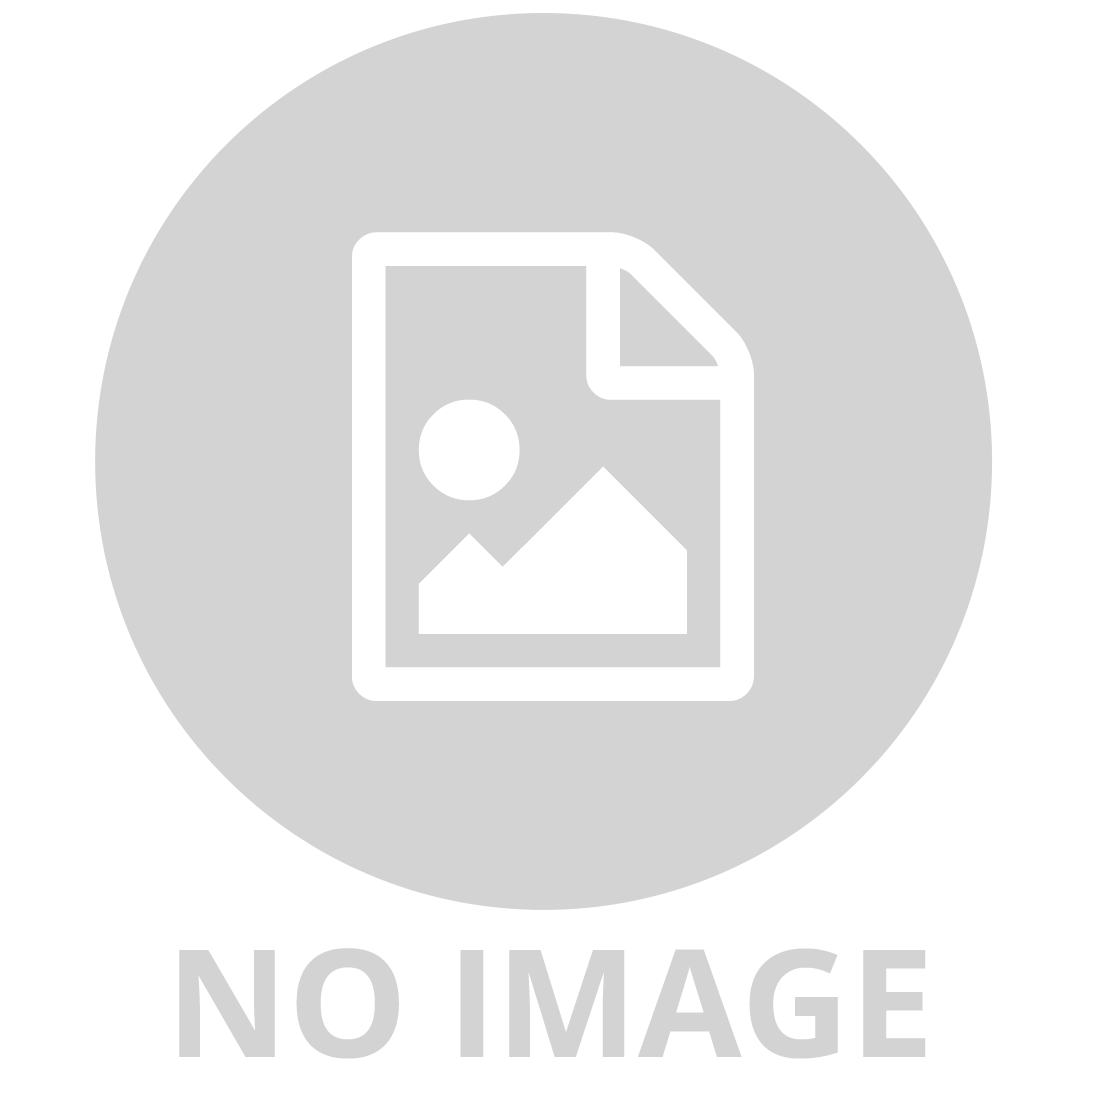 LEGO MINECRAFT 21150 SKELETON BIGFIG WITH MAGMA